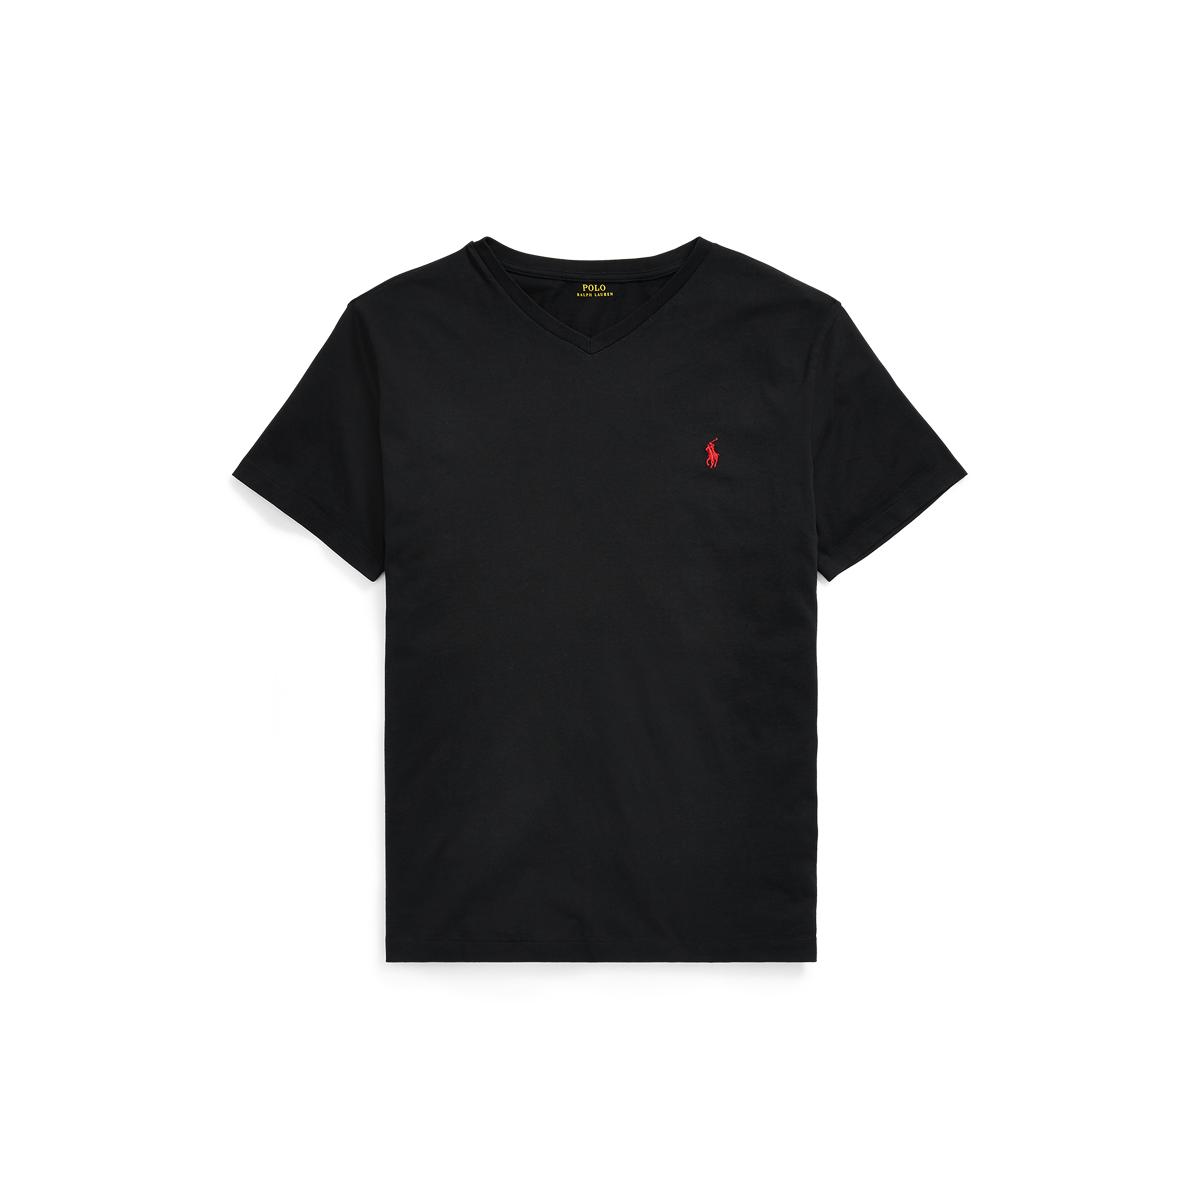 79d4950c5ef9 Classic Fit V-Neck T-Shirt | Tees T-Shirts & Sweatshirts | Ralph Lauren